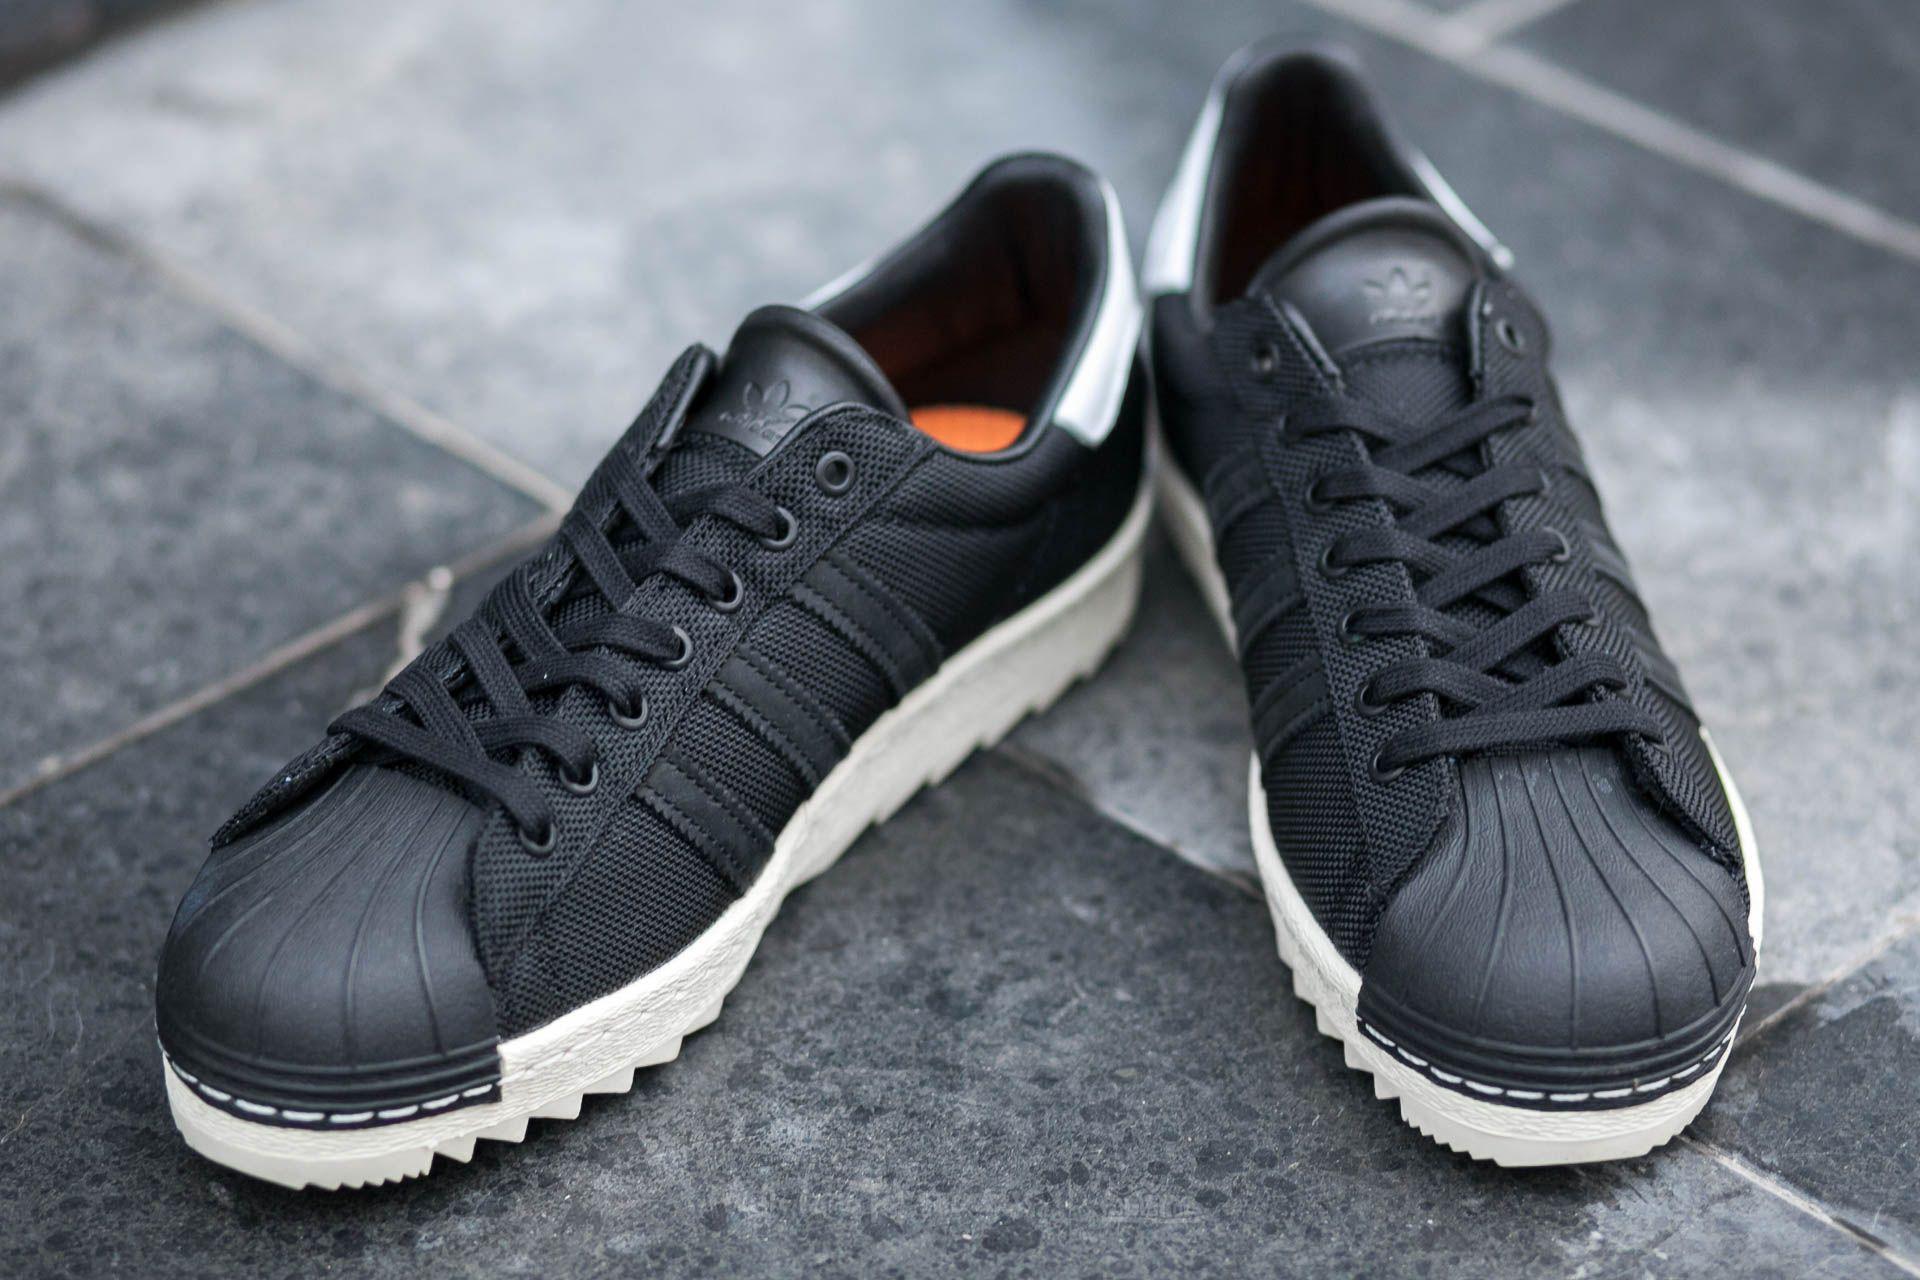 Adidas superstar 80s cordura sneakers blackwhite